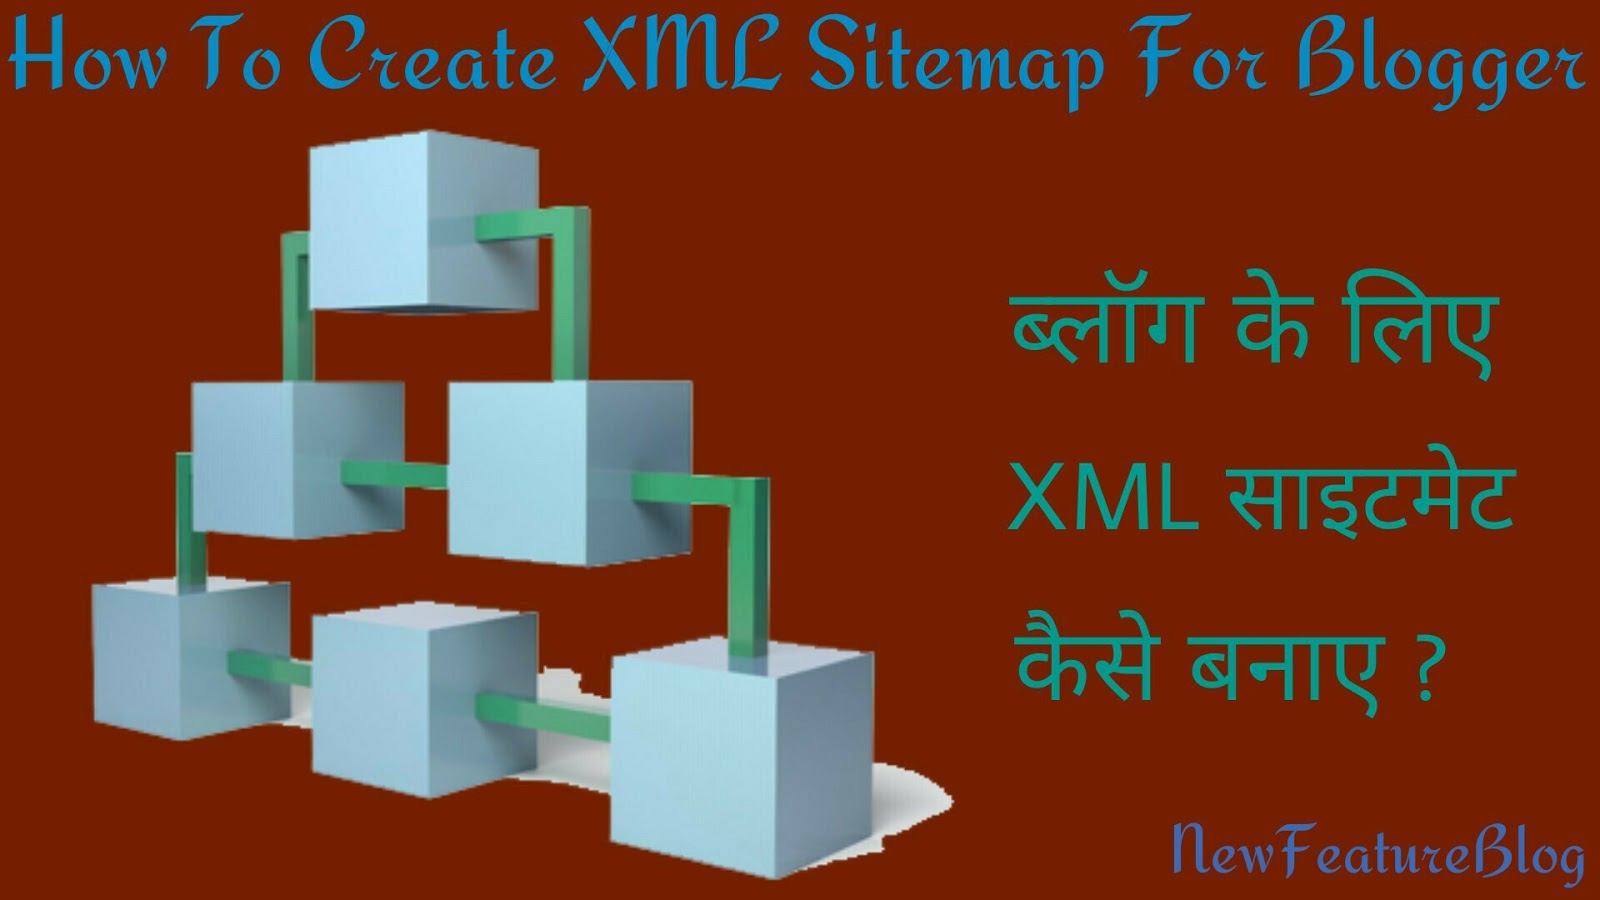 xml sitemap kaise banaye blog ya website ke liye new feature blog